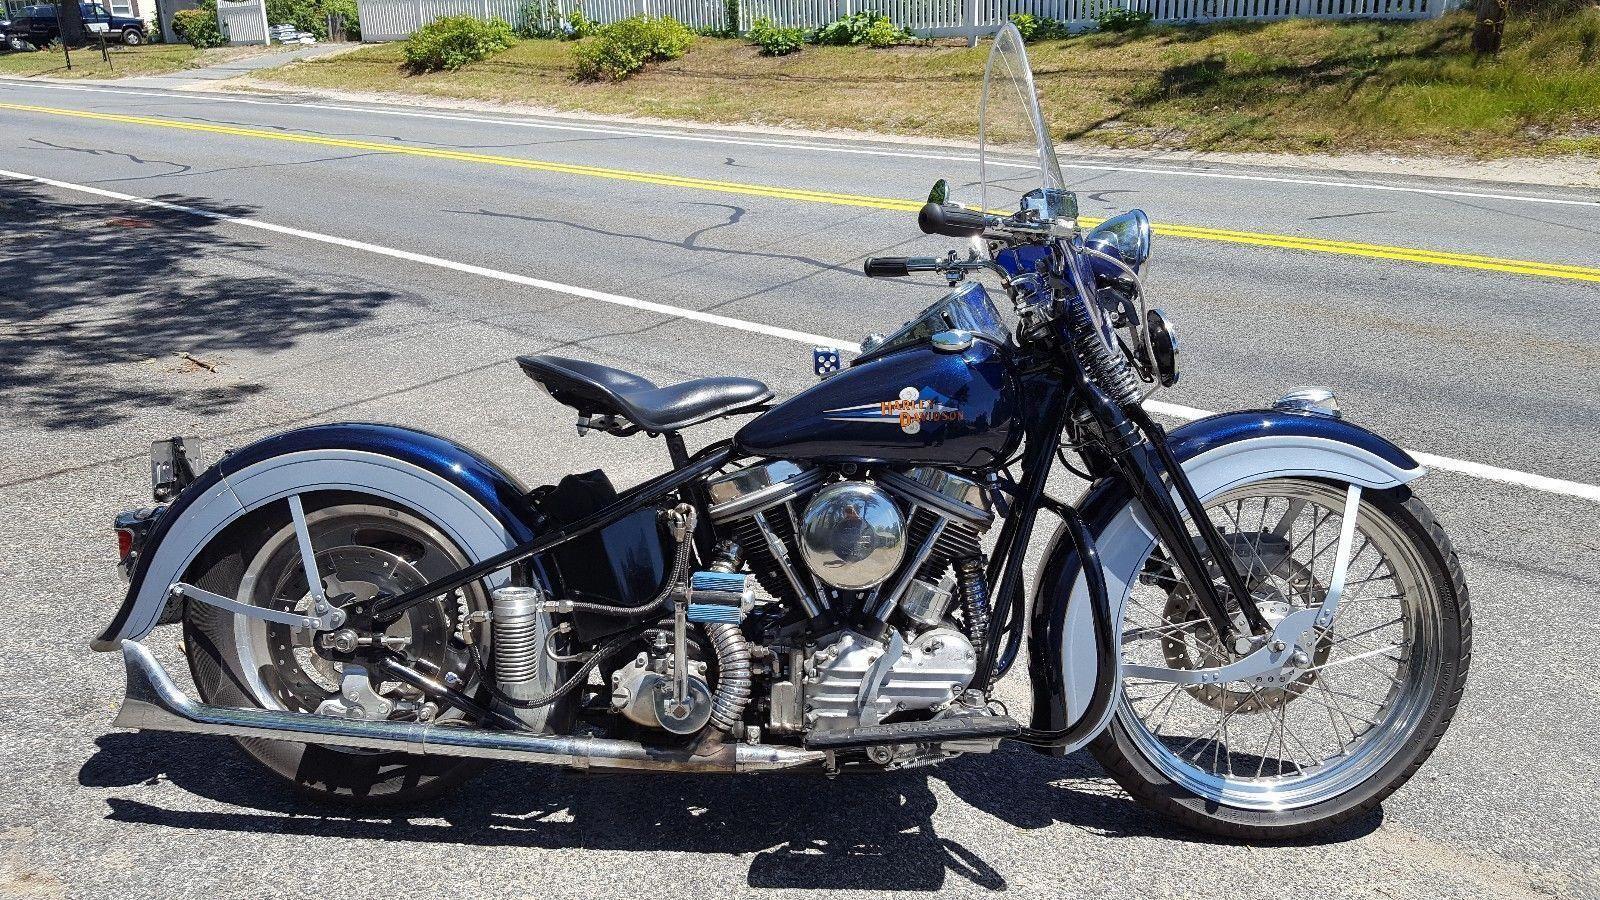 harley davidson dyna all models Harleydavidsondyna(画像あり